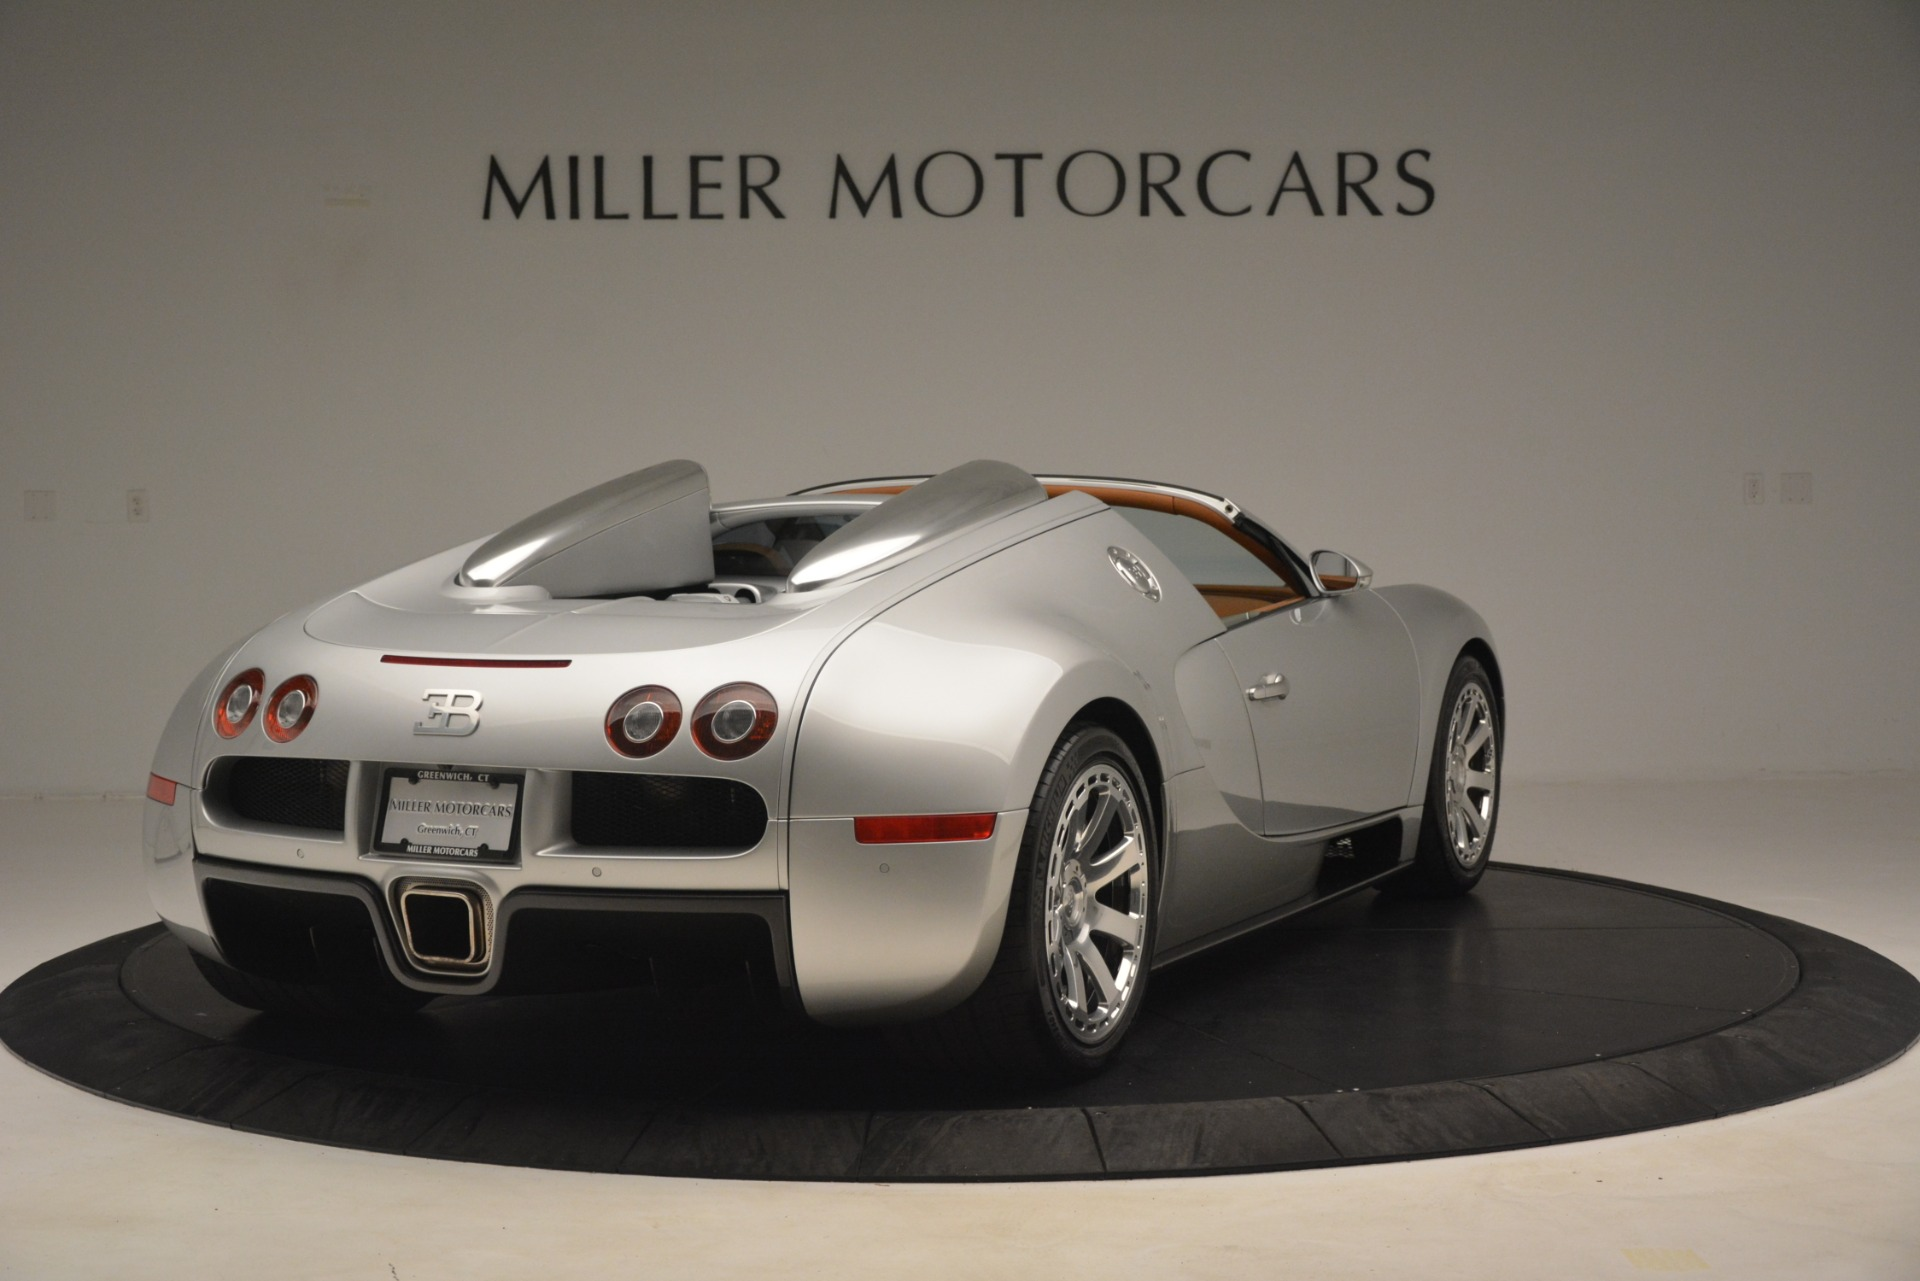 Used 2010 Bugatti Veyron 16.4 Grand Sport For Sale In Greenwich, CT 3159_p8